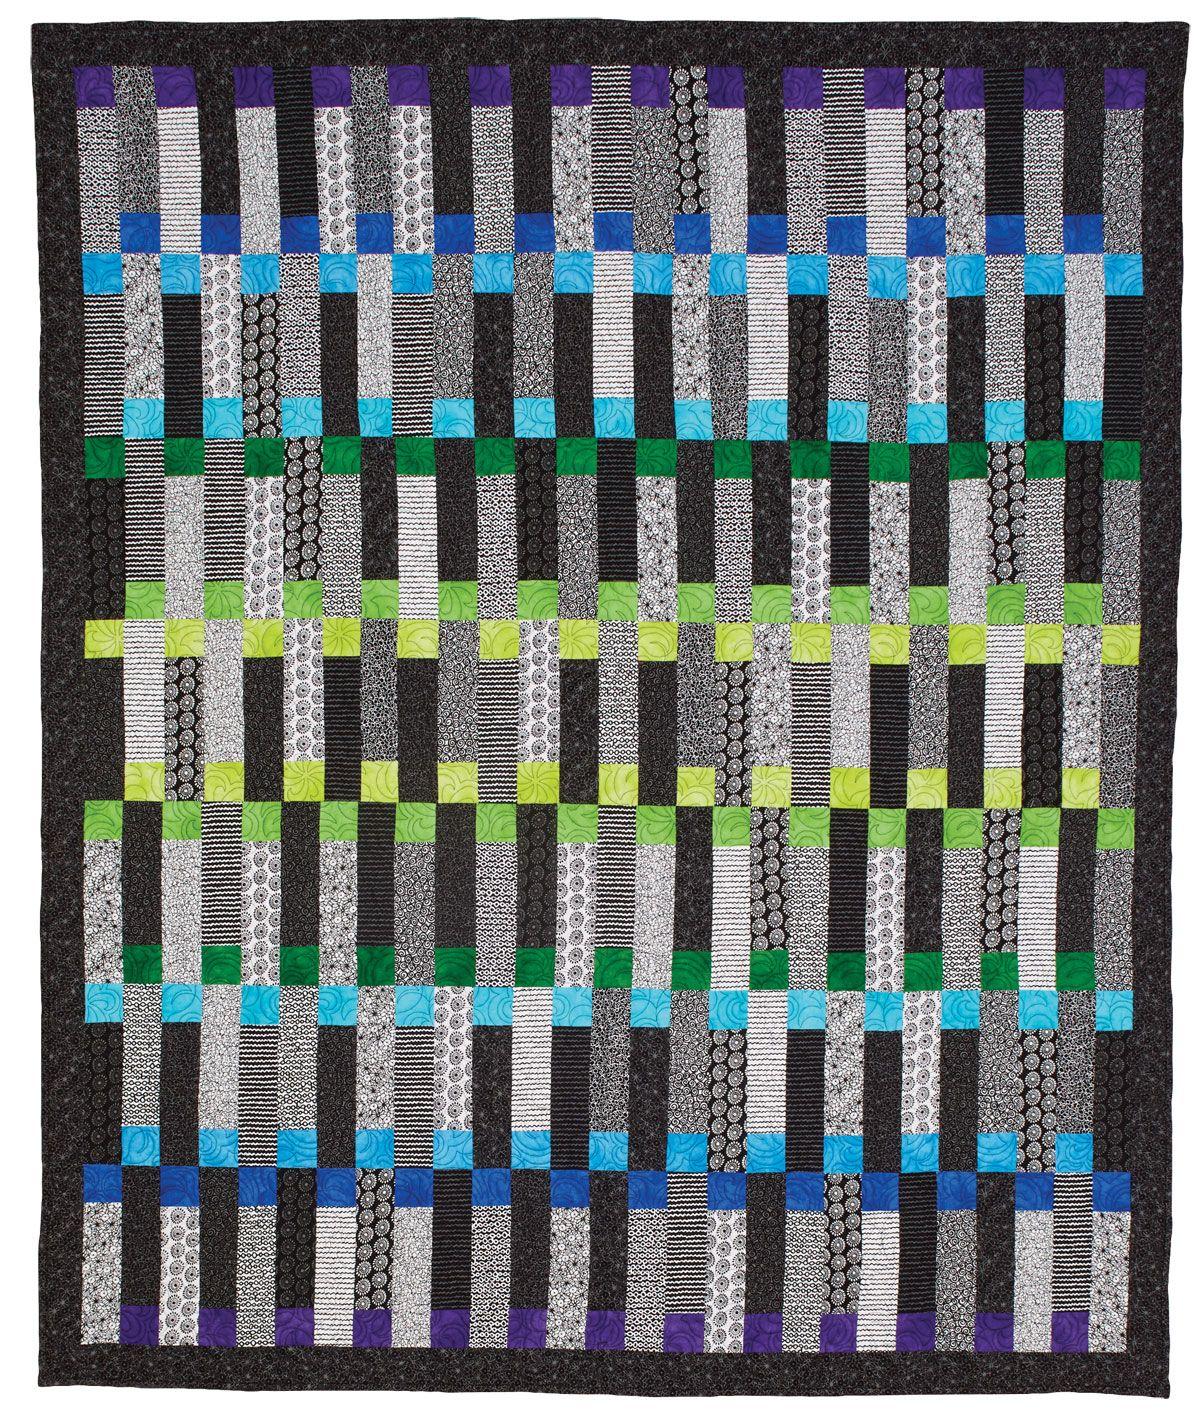 cerulean quilt  contemporary quilts patterns and quilt modern - cerulean quilt